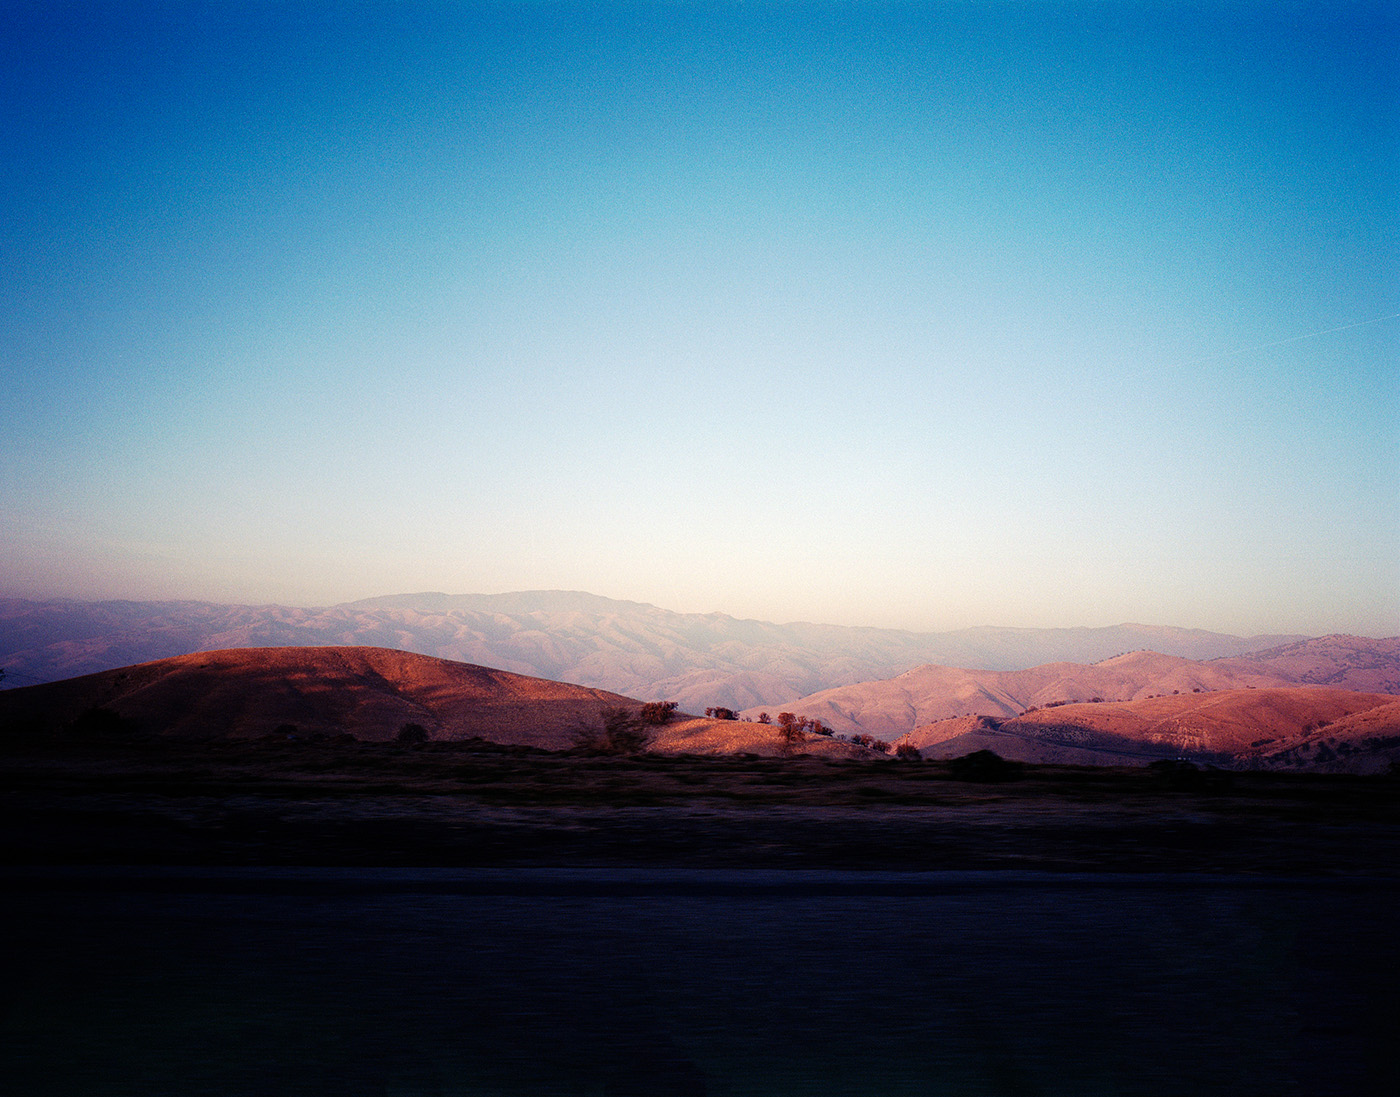 Deborah_Farnault_Red_Rock_Canyon_California_2018_06.jpg